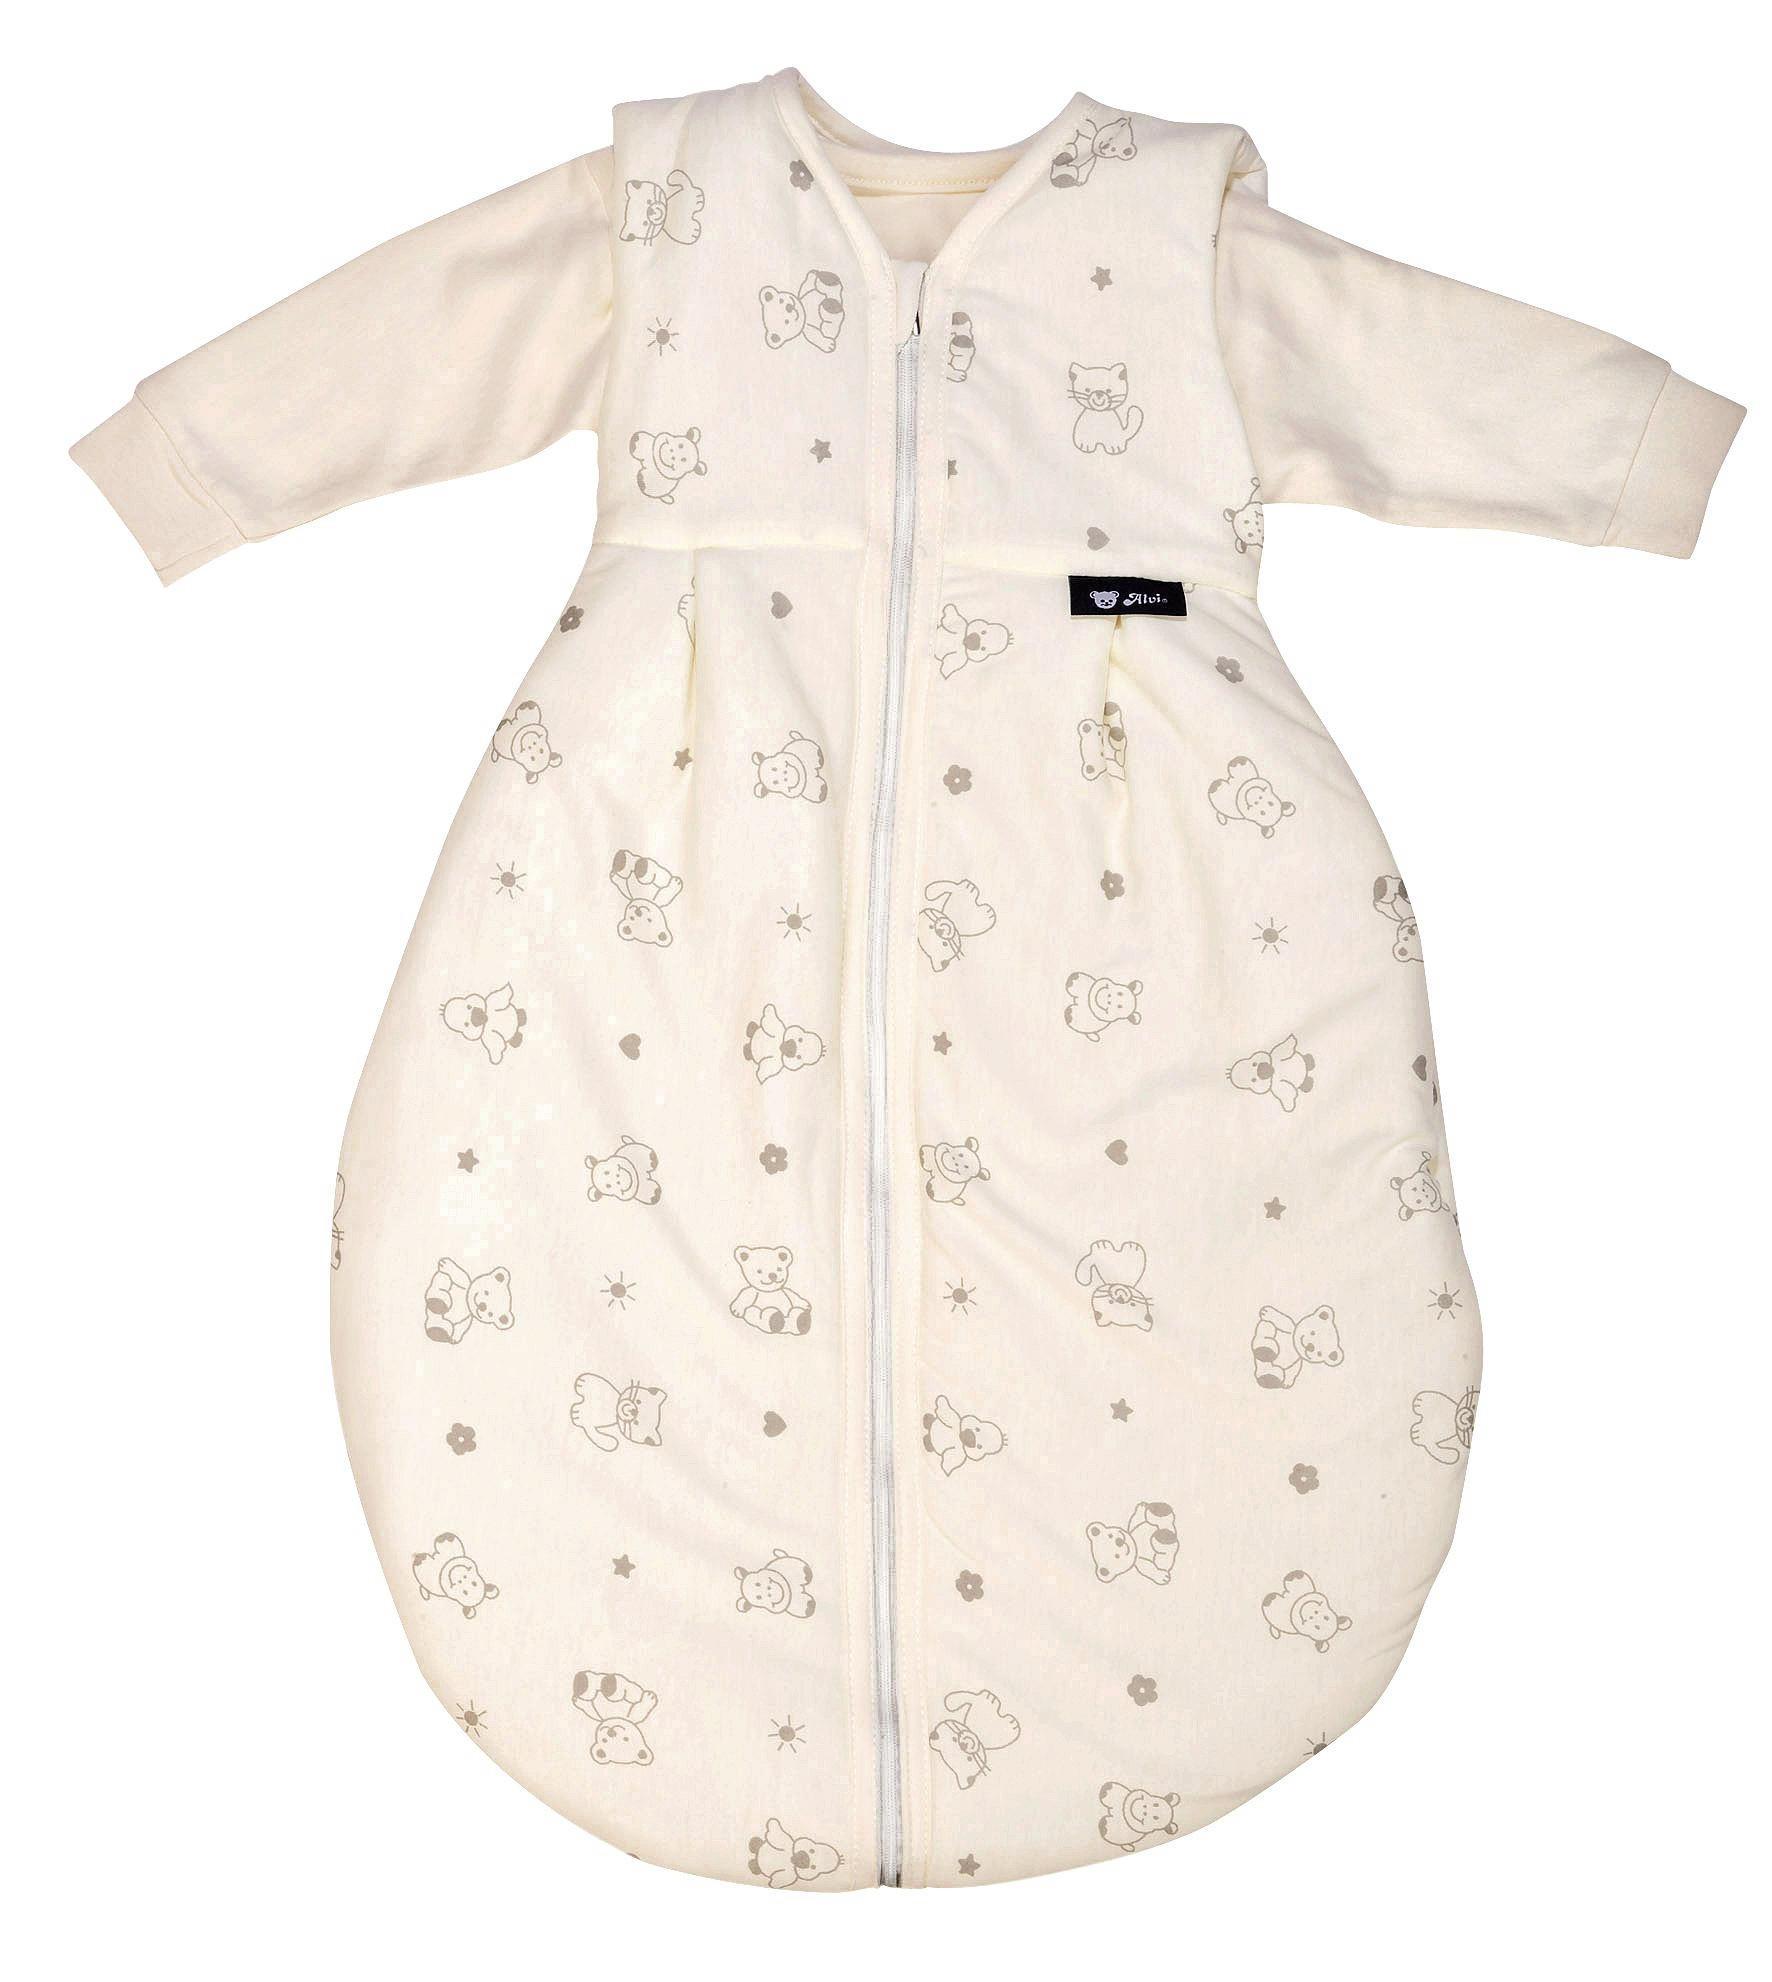 BABYSCHLAFSACK - Basics, Textil (60cm)